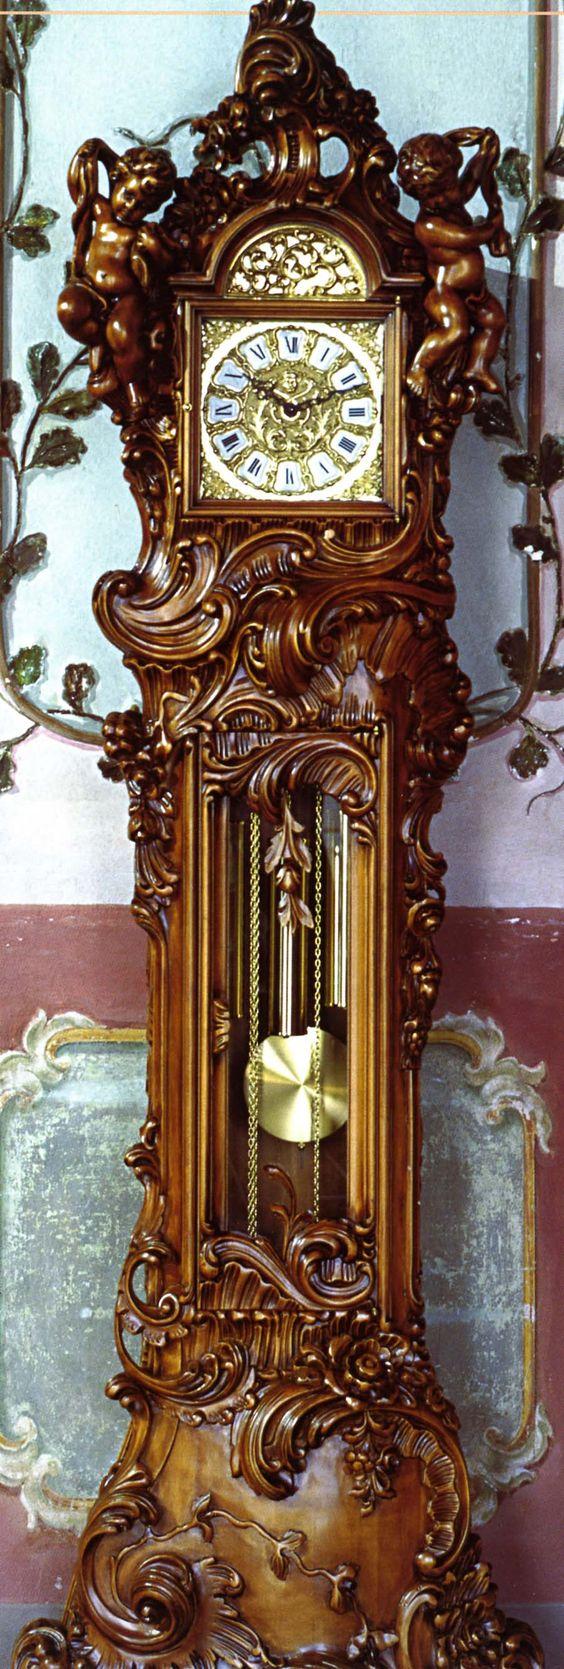 Ornately carved Le Ore grandfather clock. (Italian)